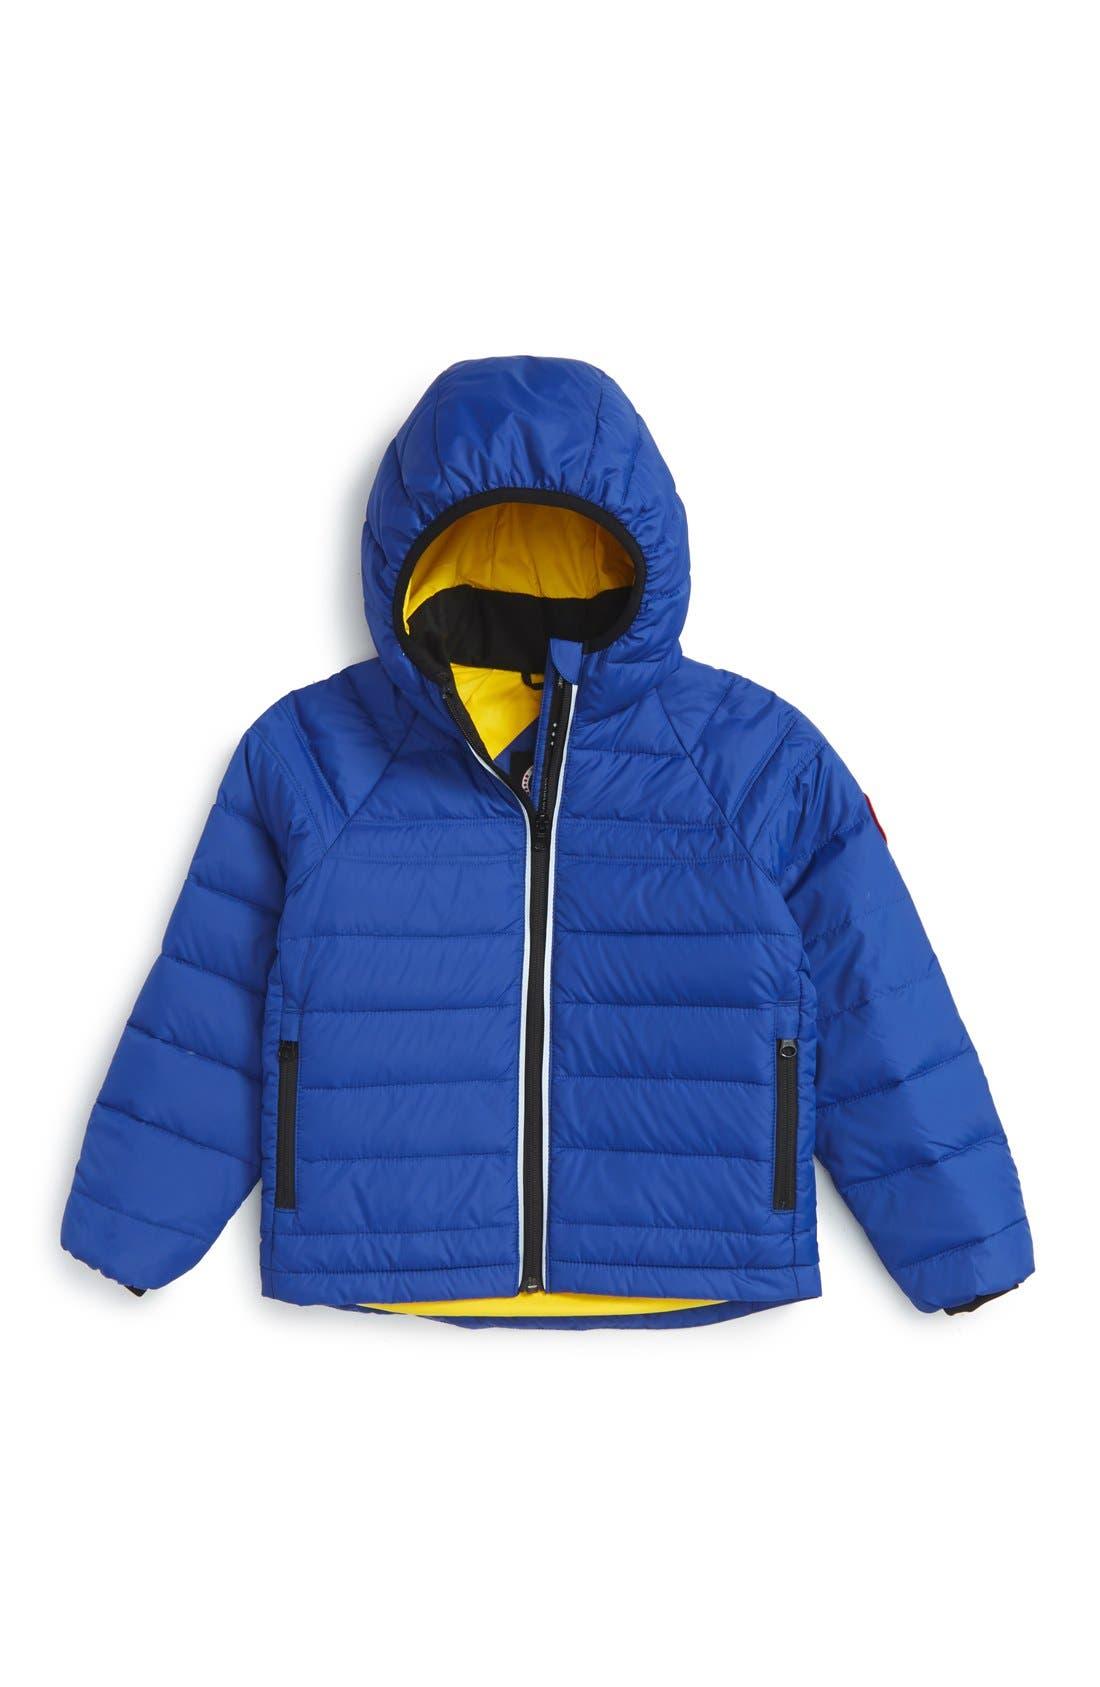 Main Image - Canada Goose 'Bobcat' Packable Down Coat (Toddler & Little Kid)